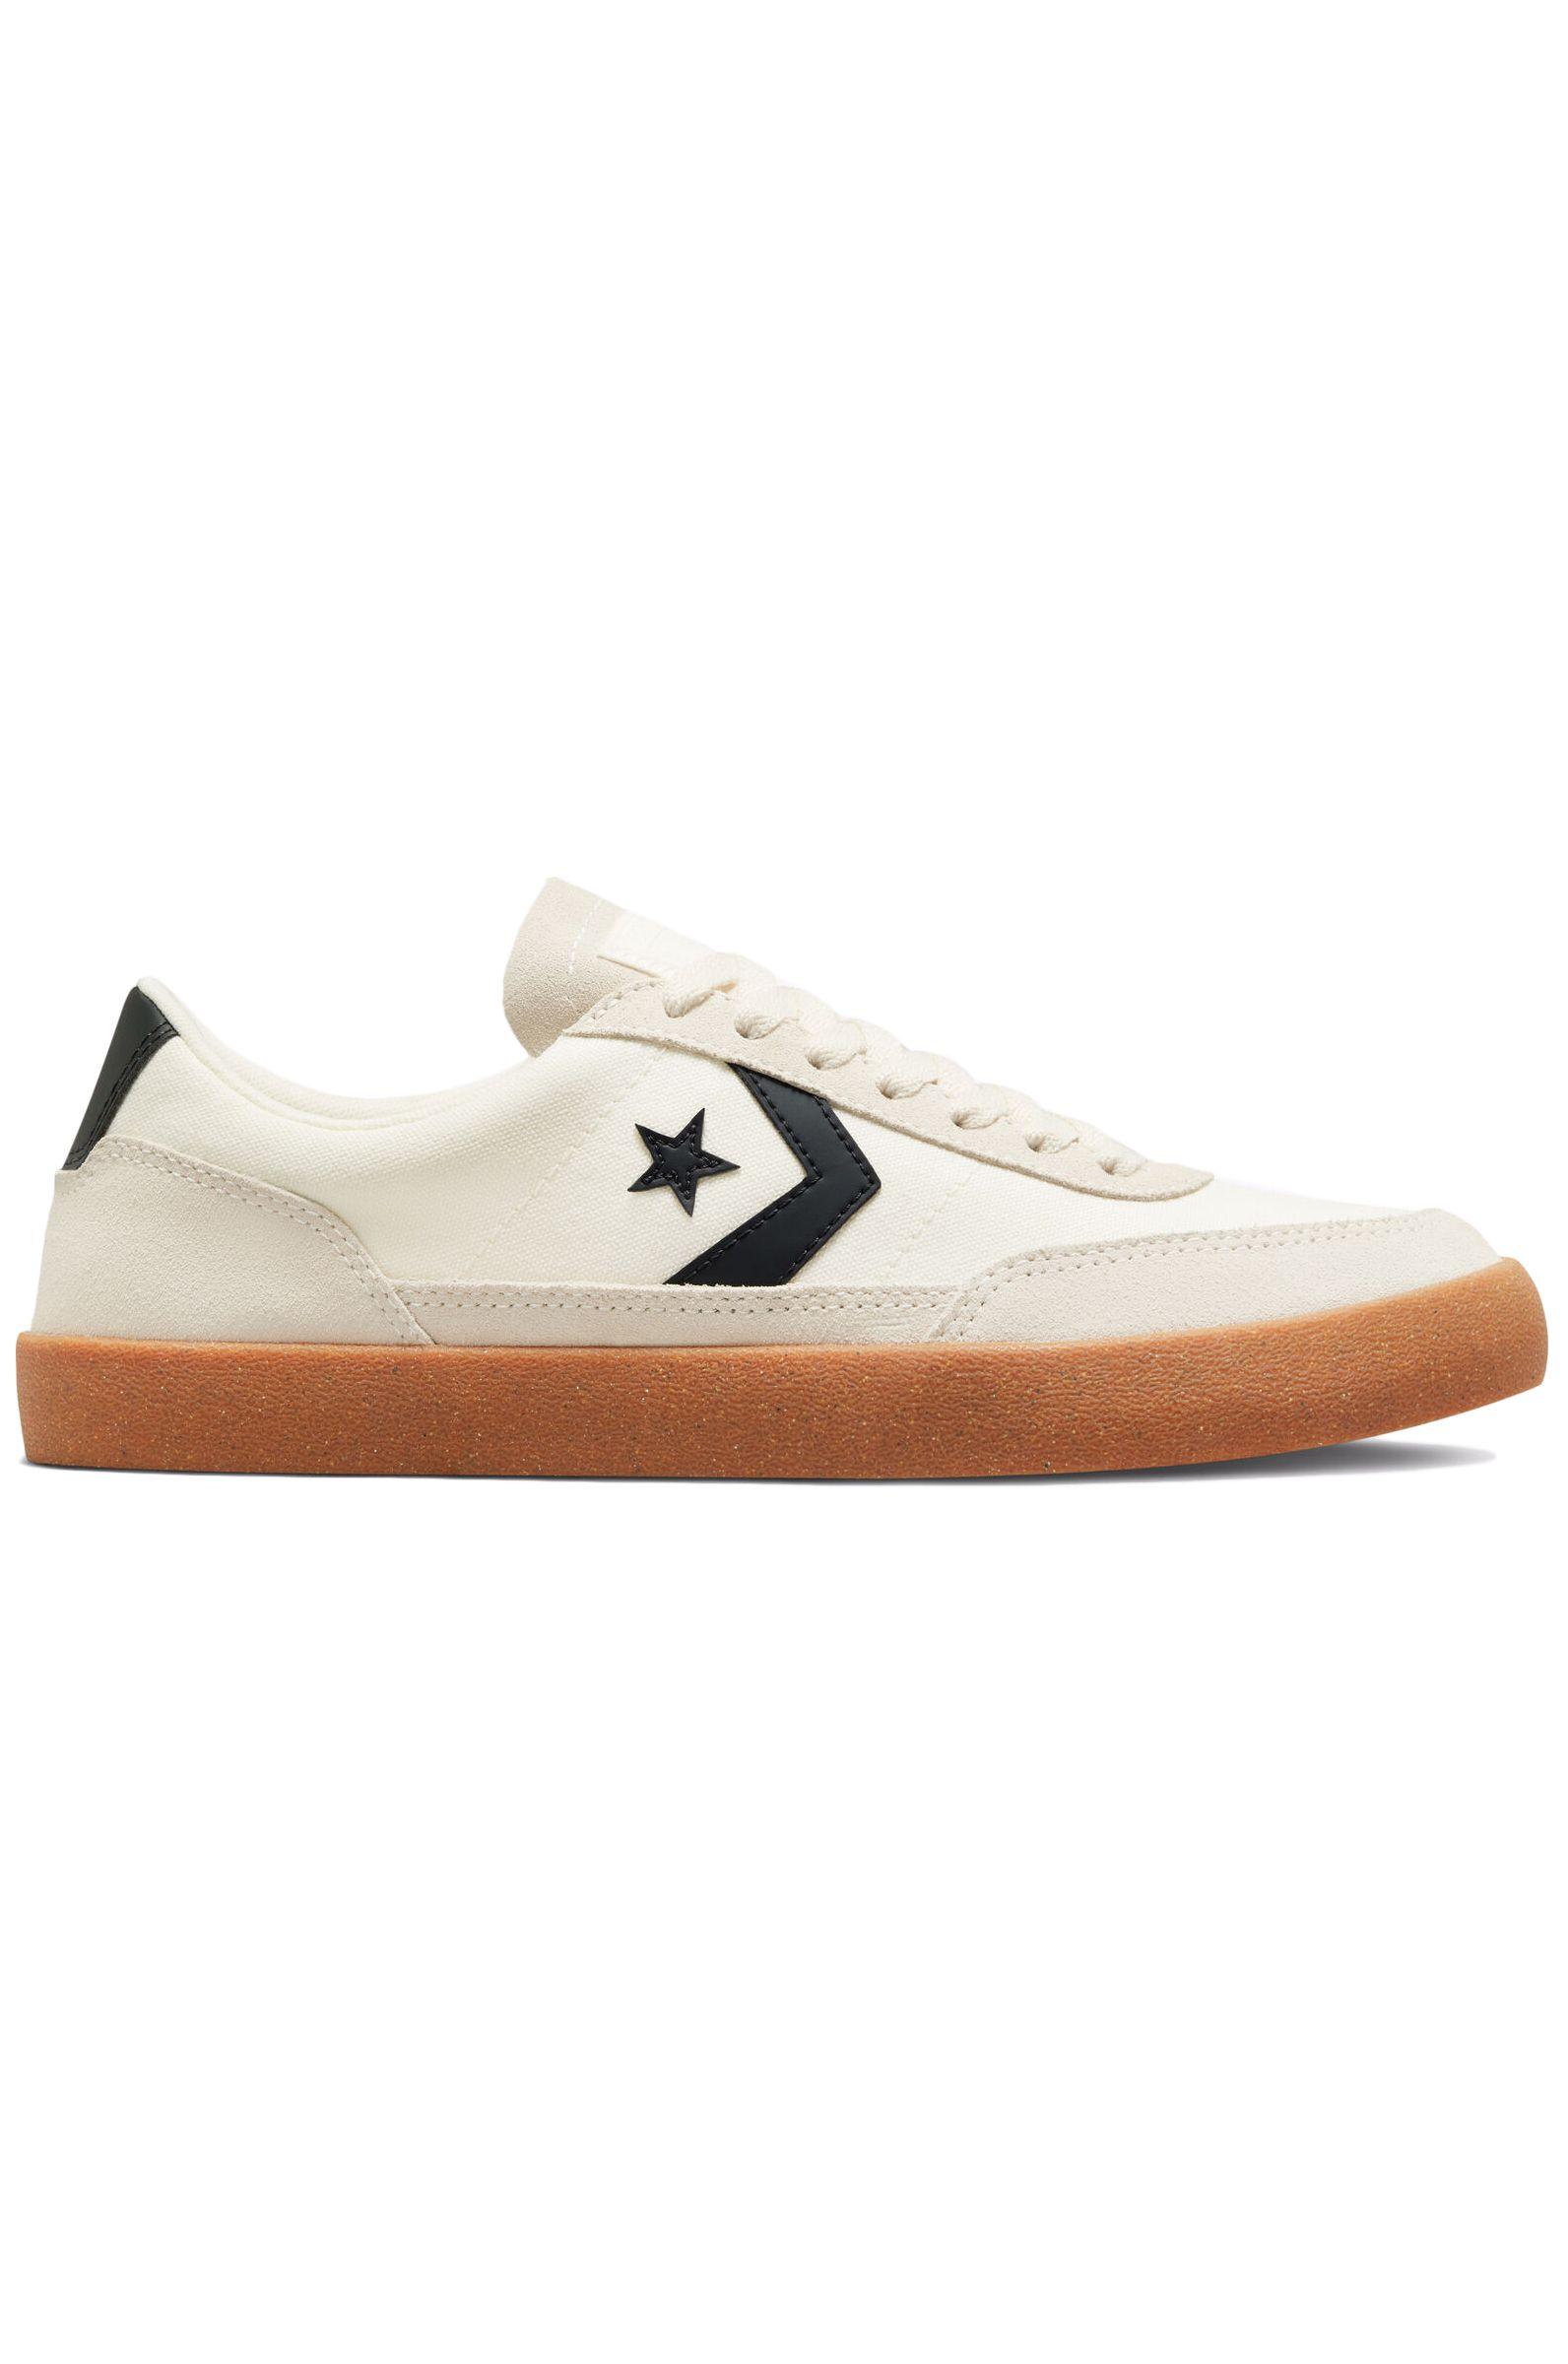 Converse Shoes NET STAR CLASSIC OX Egret/Black/Gum Honey